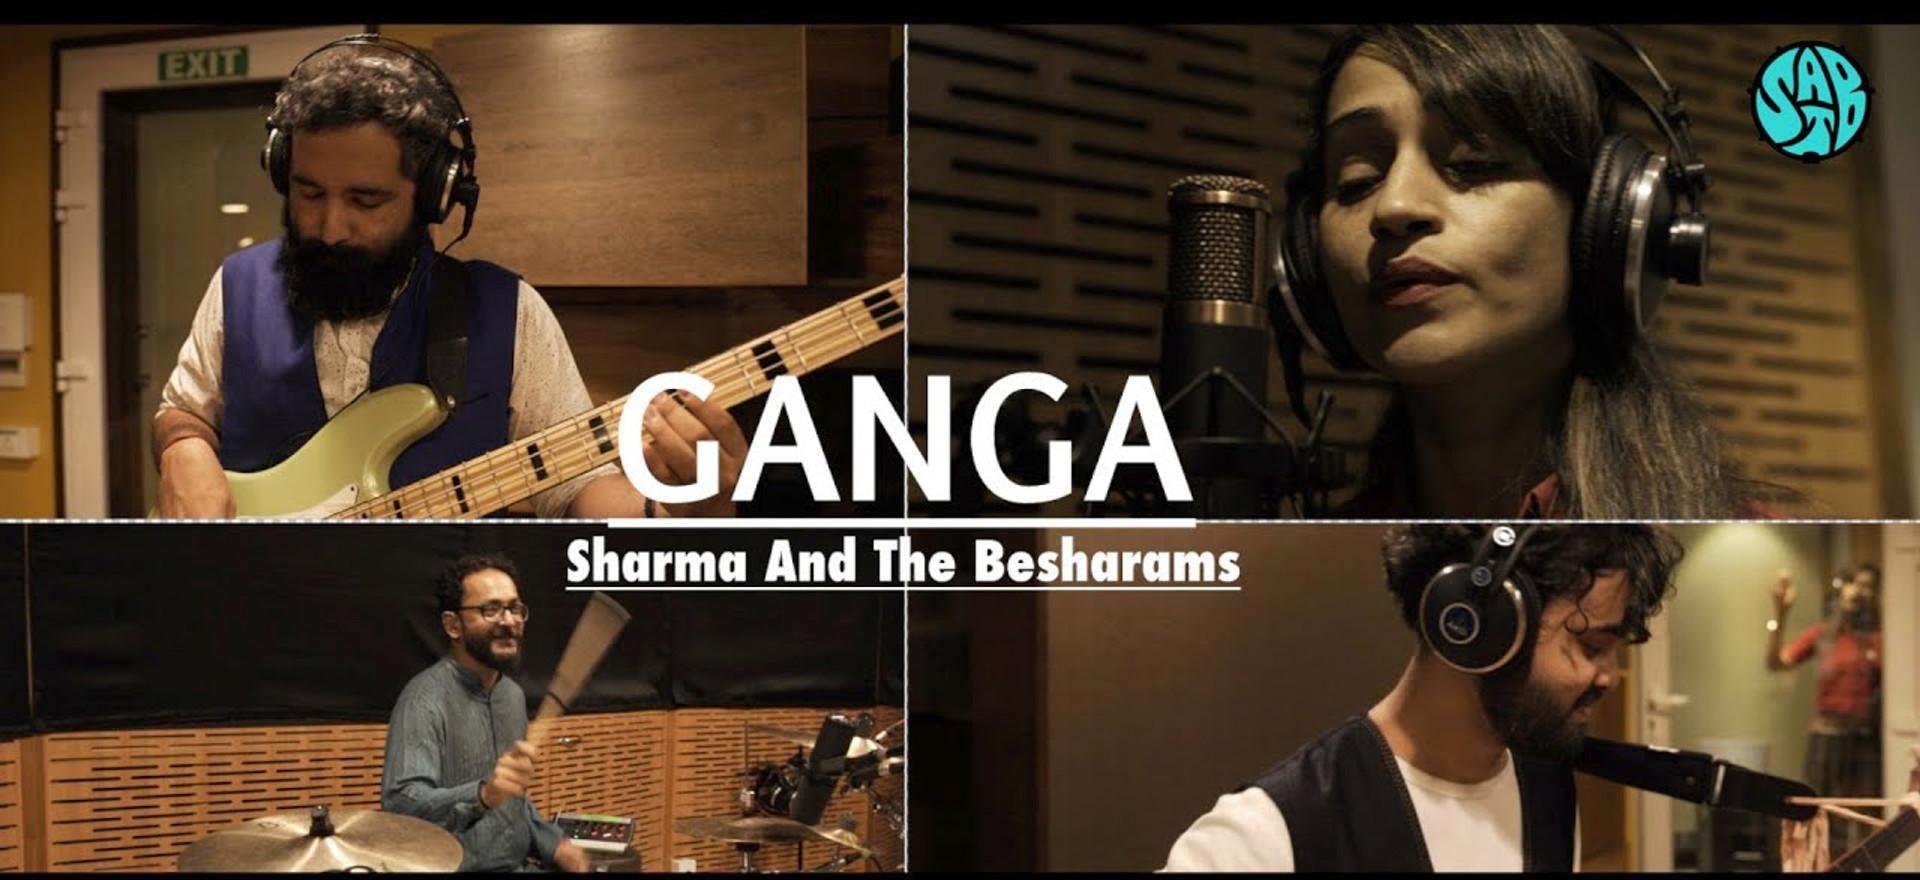 GANGA /Official Music Video/ Sharma And The Besharams